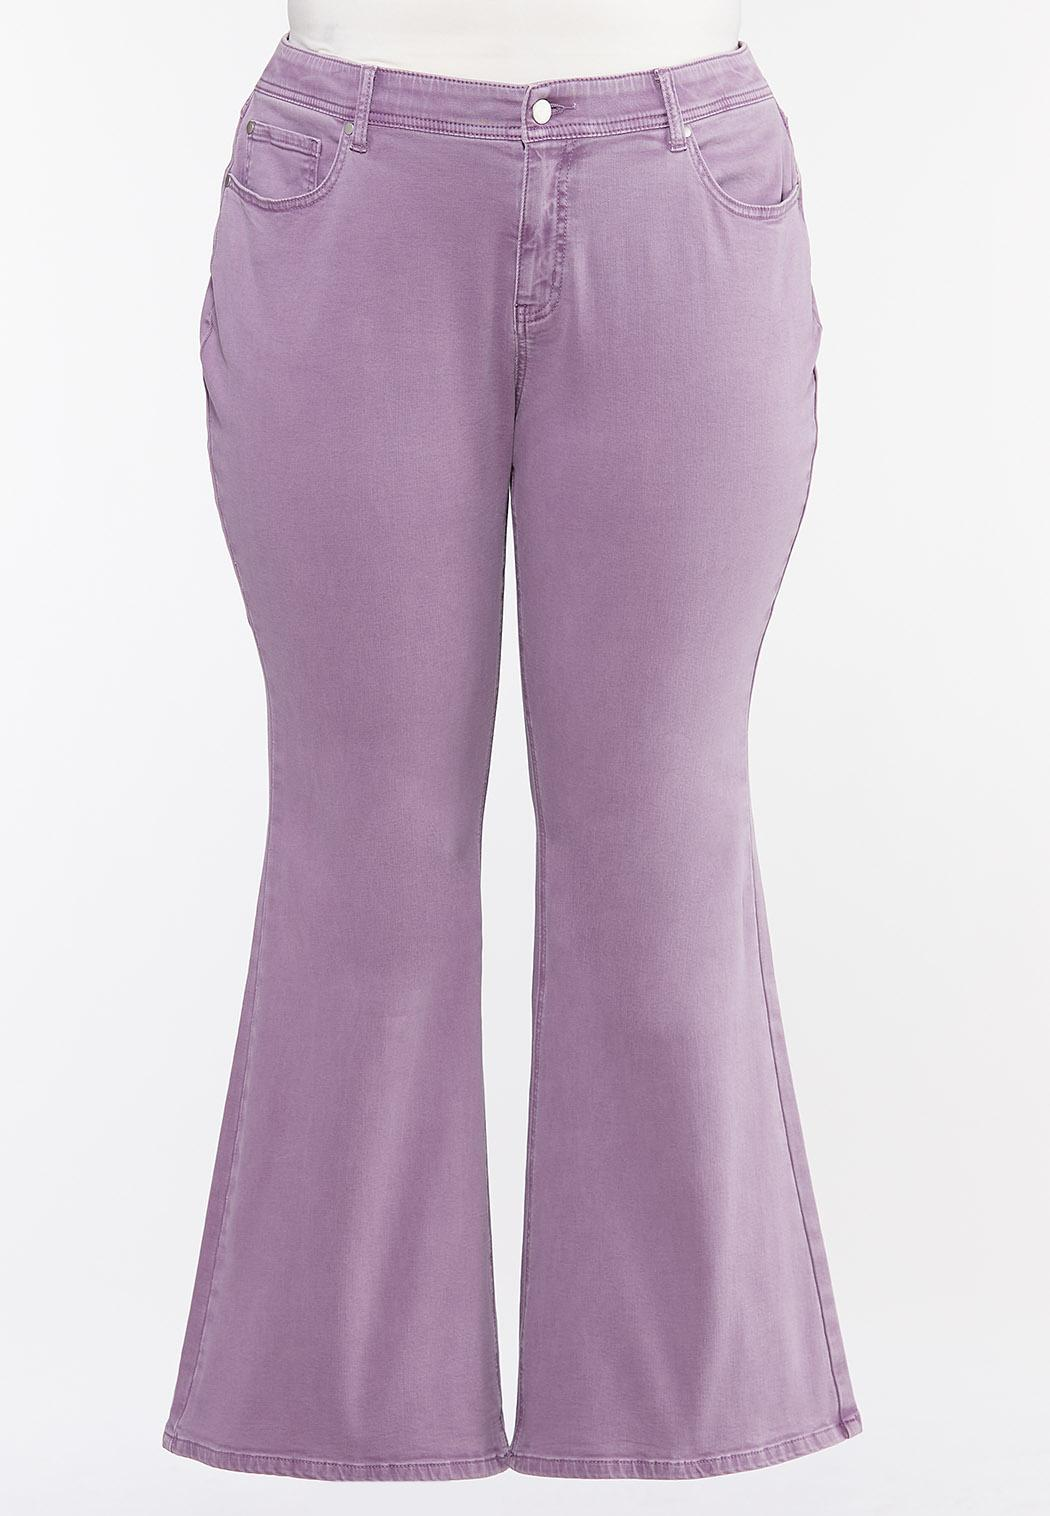 Plus Size Lavender Flare Jeans (Item #44449592)